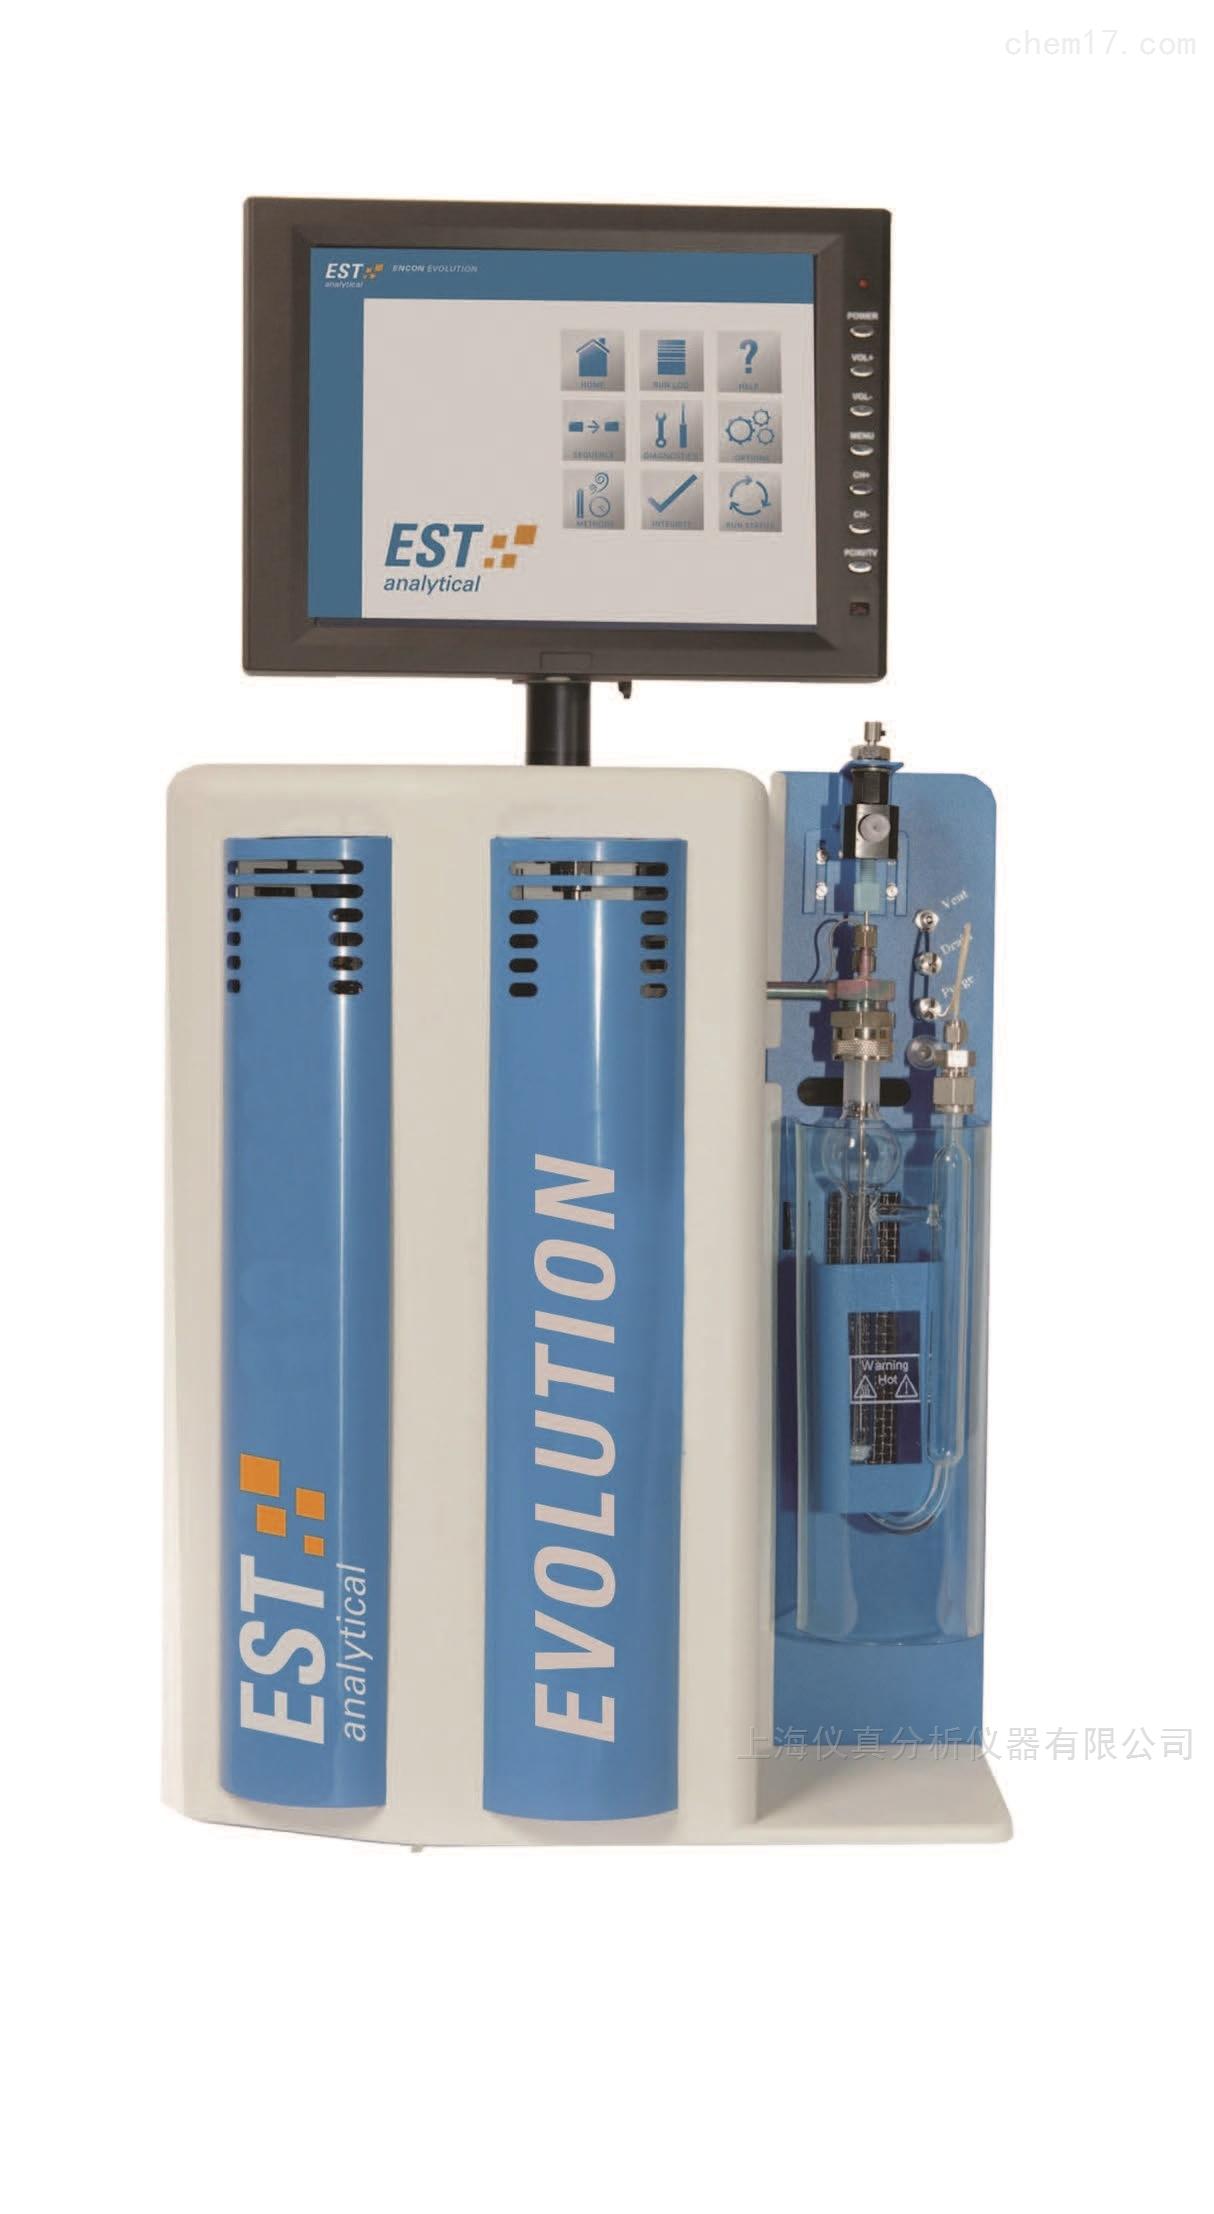 EST Evolution 吹扫捕集浓缩仪 VOC